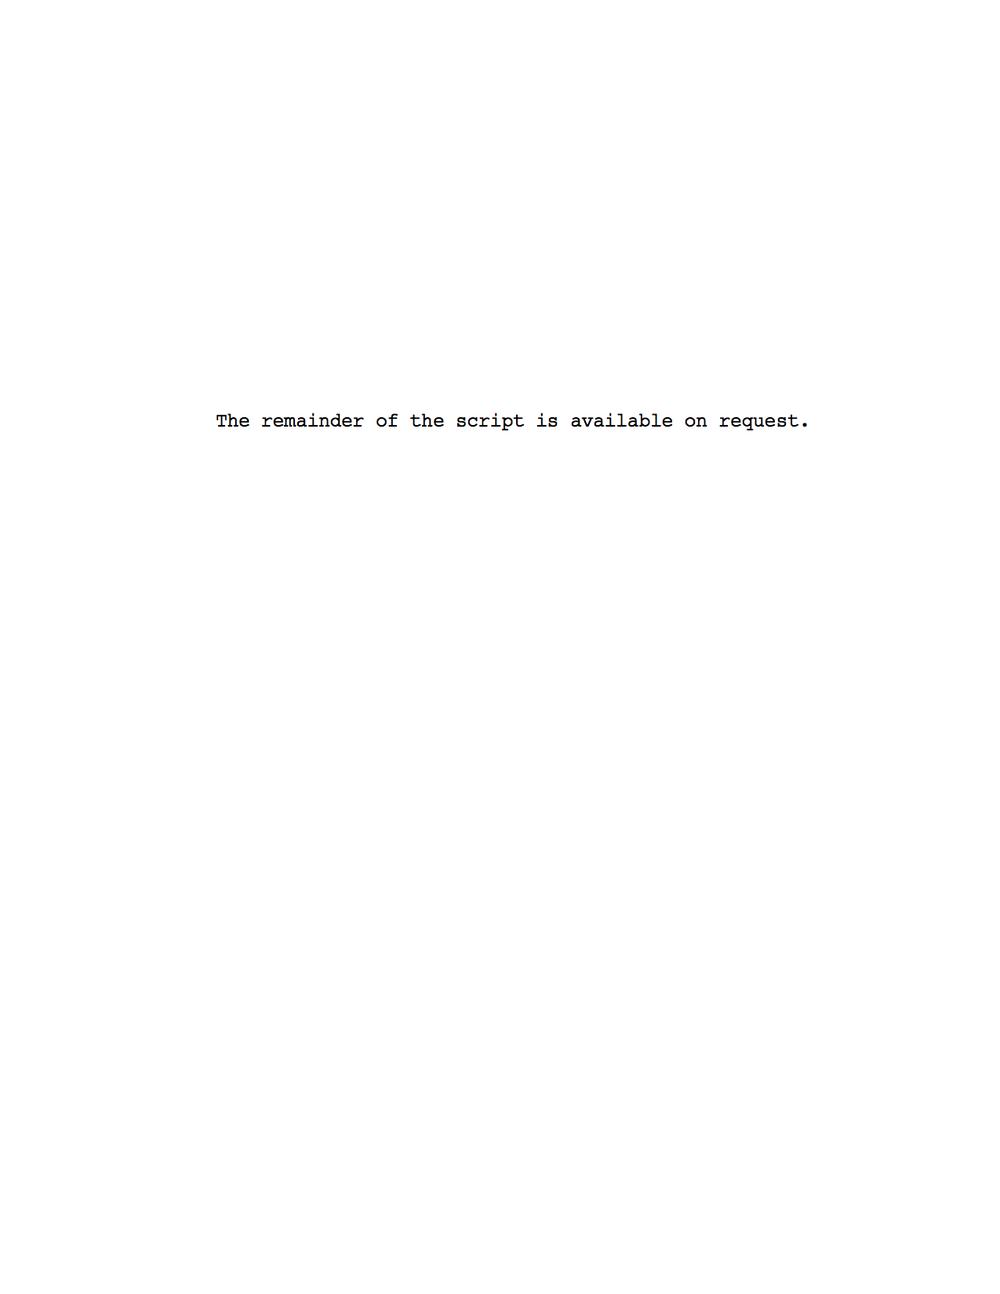 Hamshira | Alexander Craig | Remainder.jpg